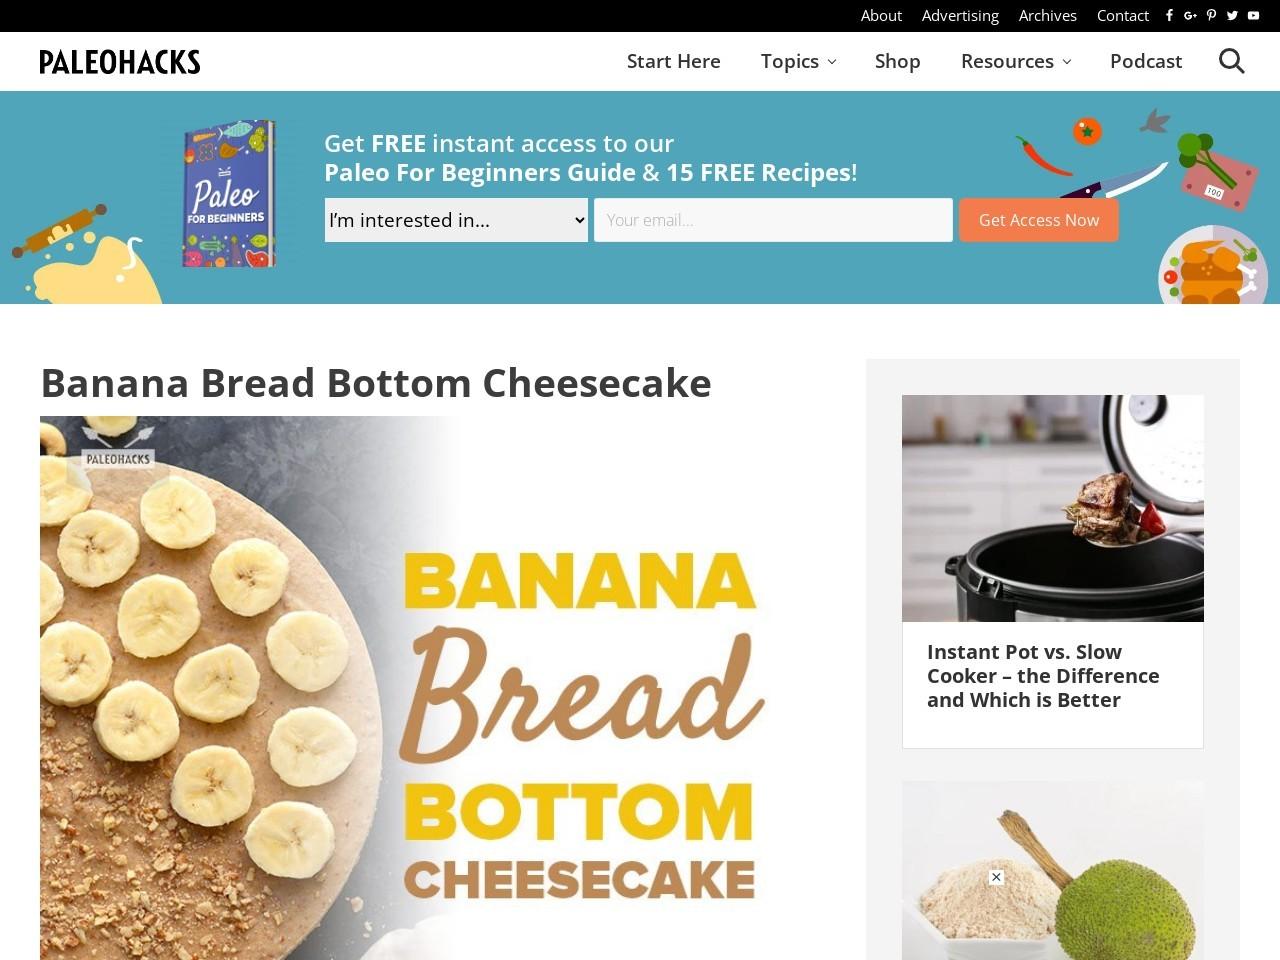 Banana Bread Bottom Cheesecake